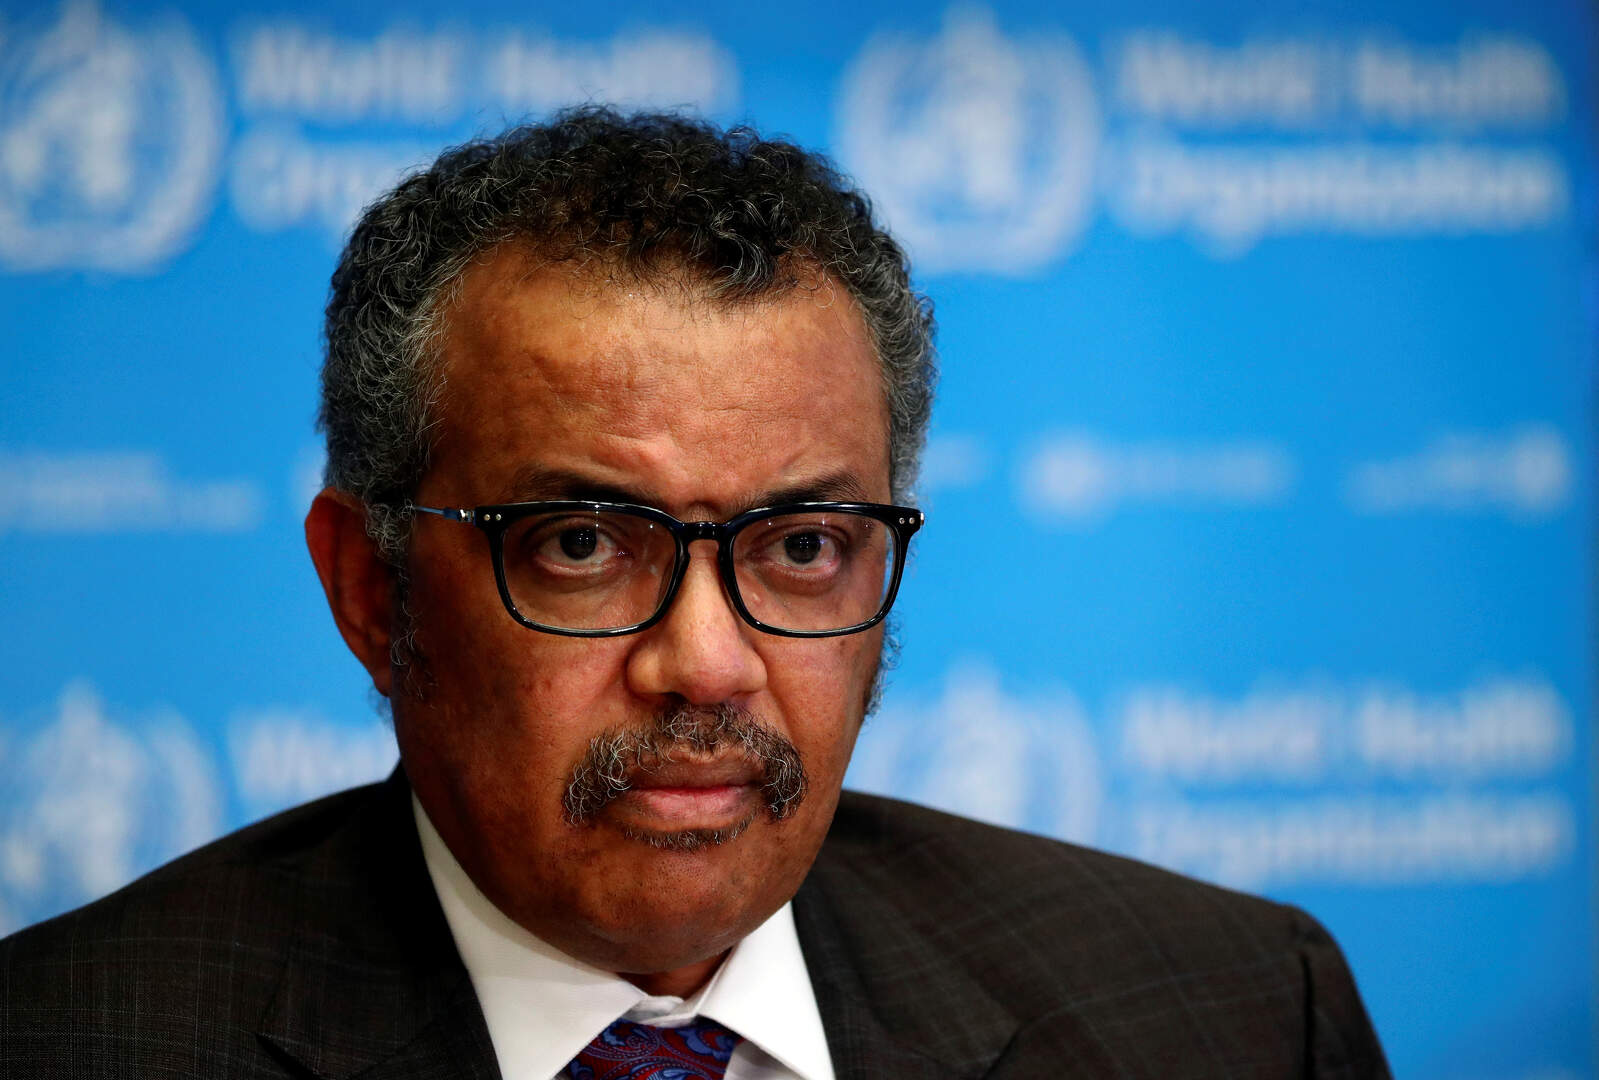 El director general de l'Organització Mundial de la Salut (OMS) Tedros Adhanom Ghebreyesus